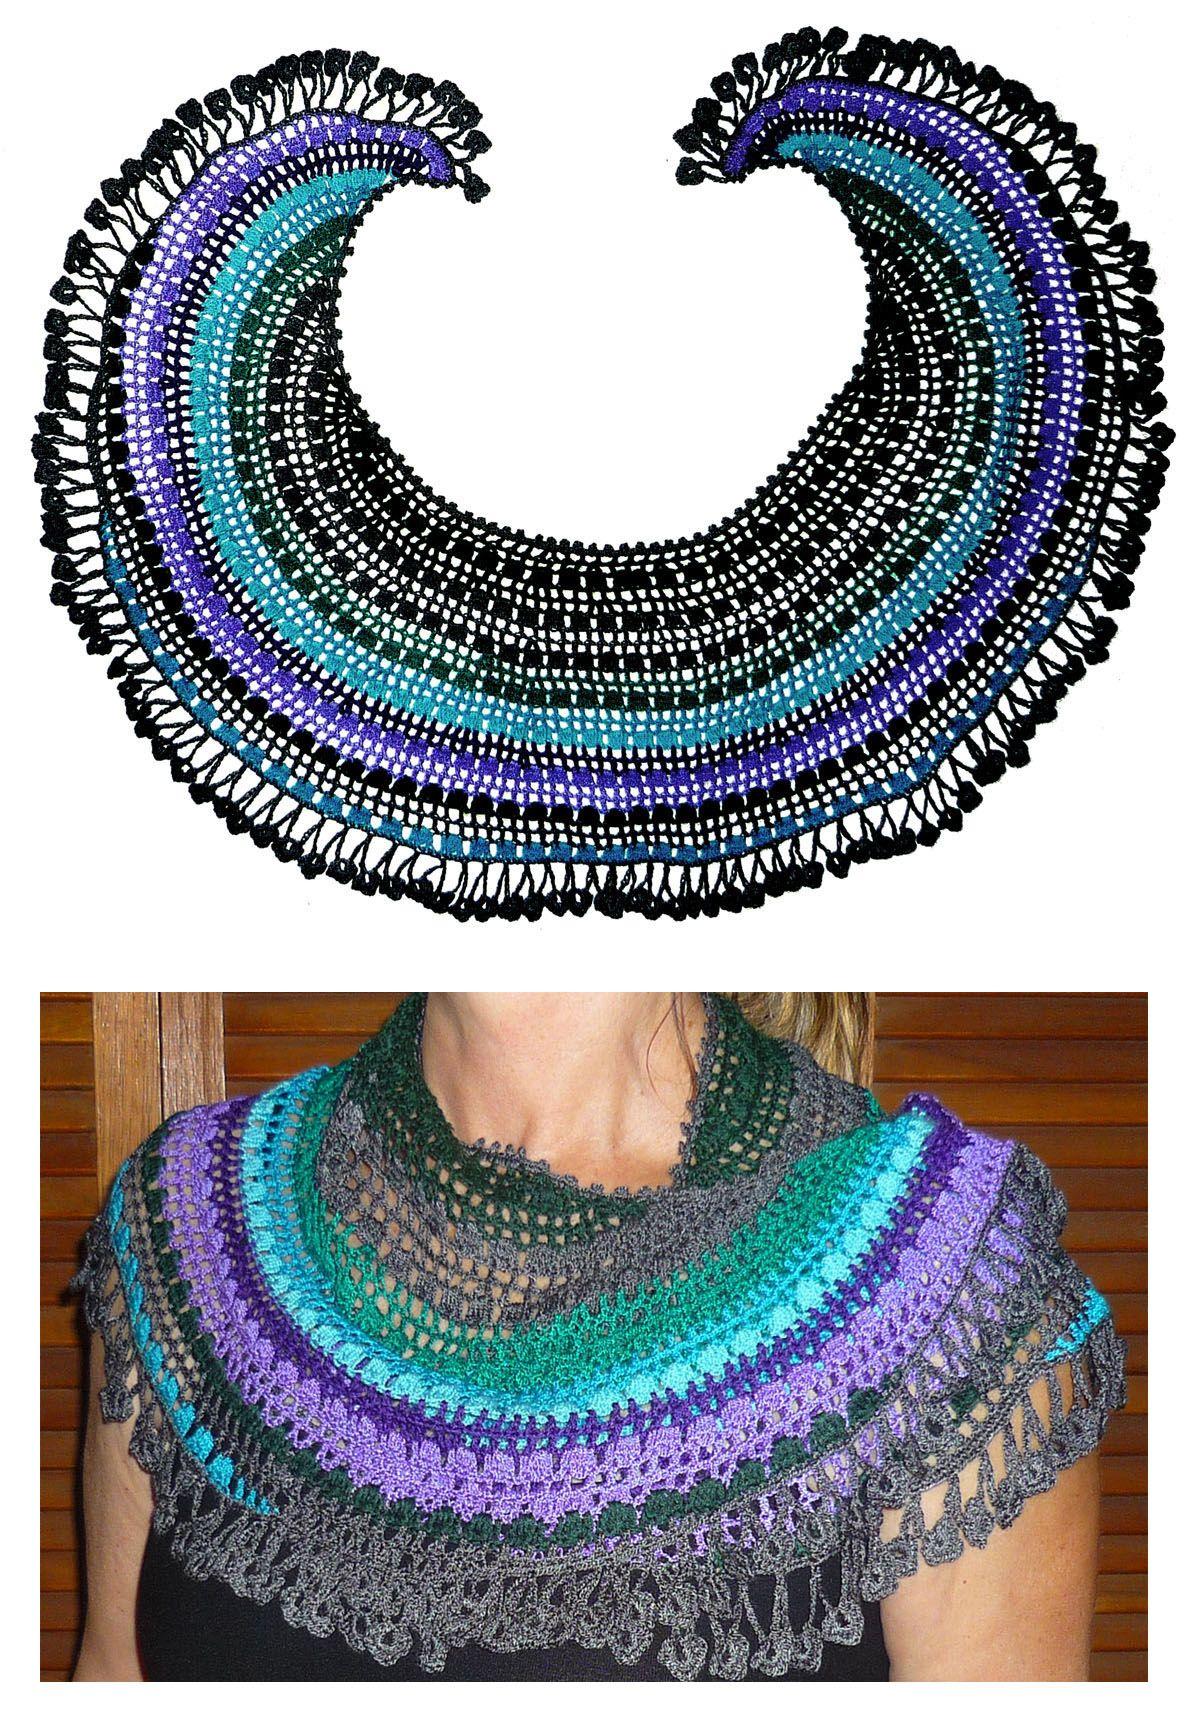 Chal de media luna tejido a crochet en hilos de colores gris, lila ...